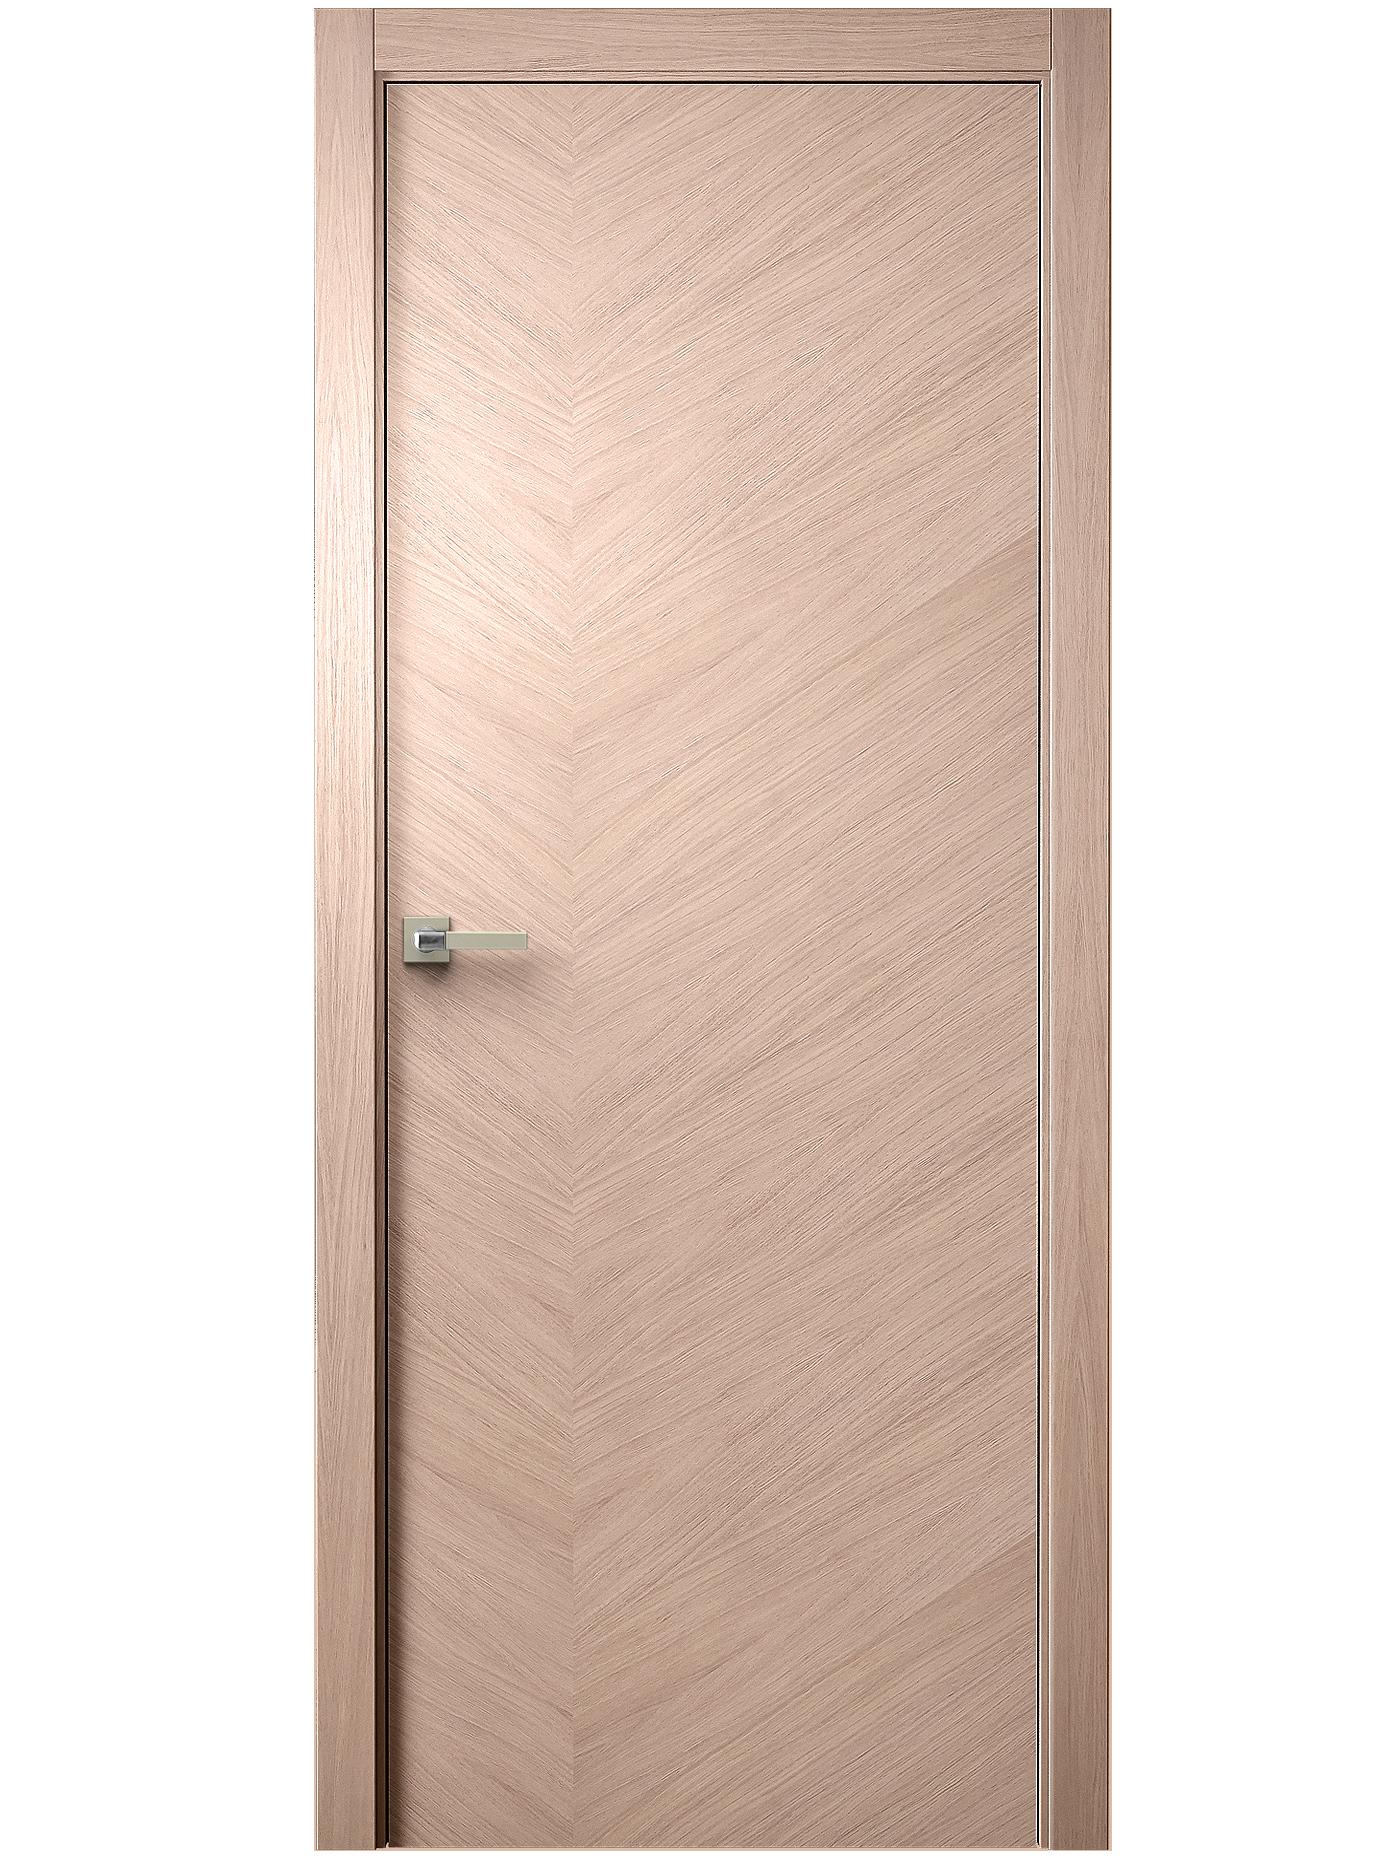 Image Tera V Interior Door Brushed Oak Tone 12 0